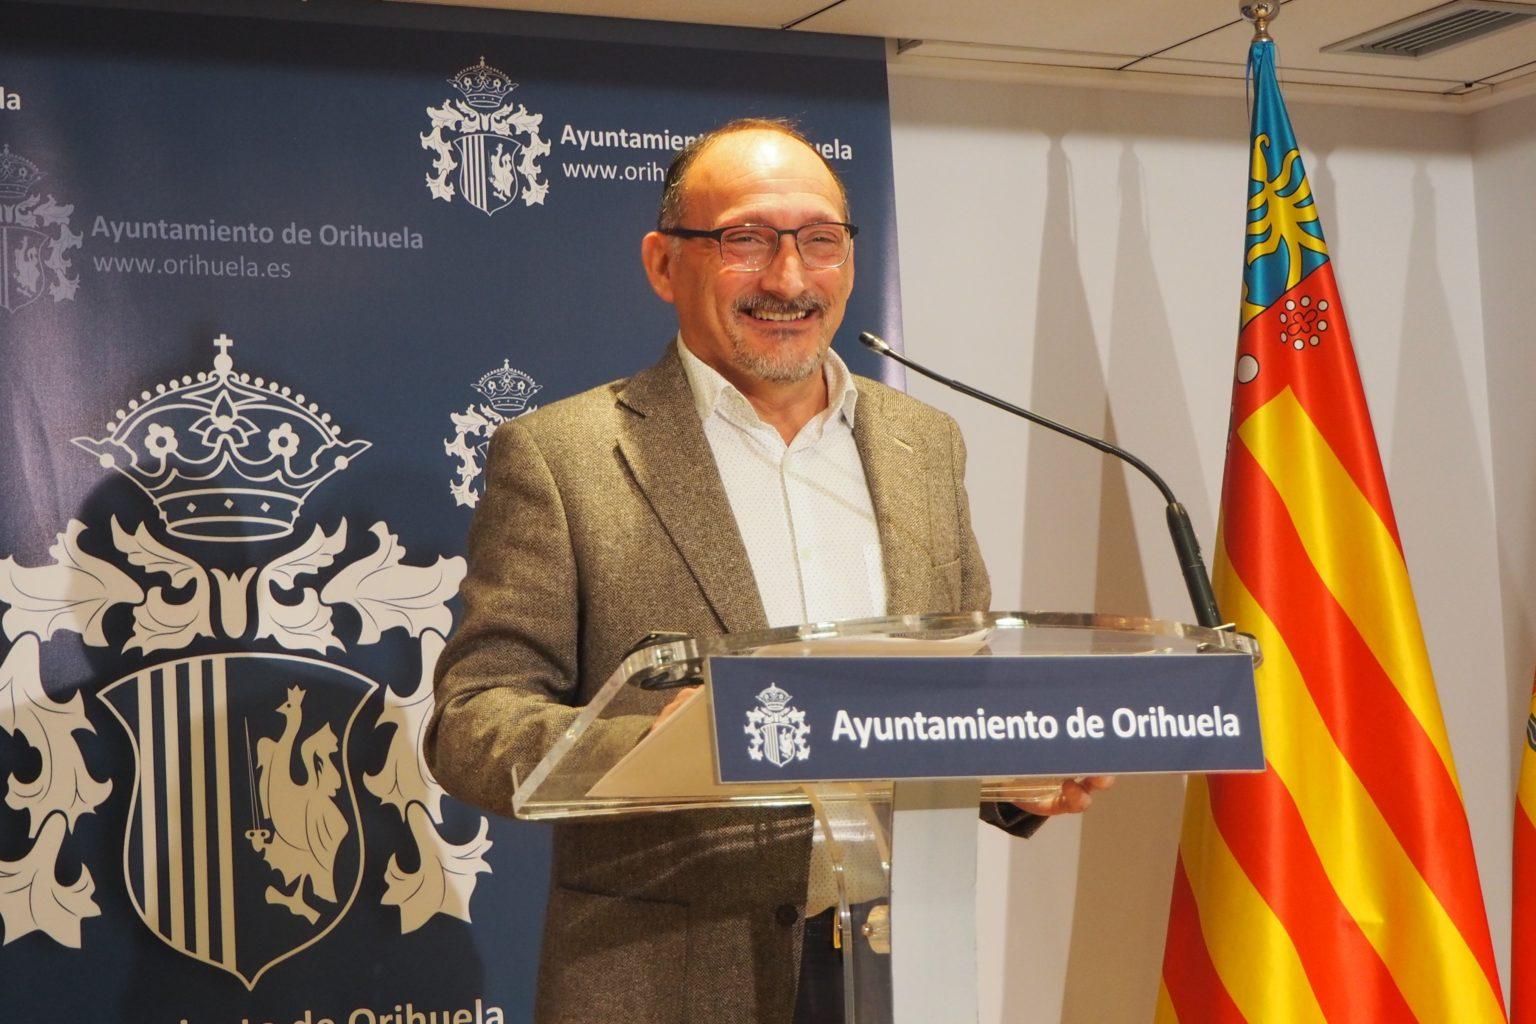 Rafael Almagro